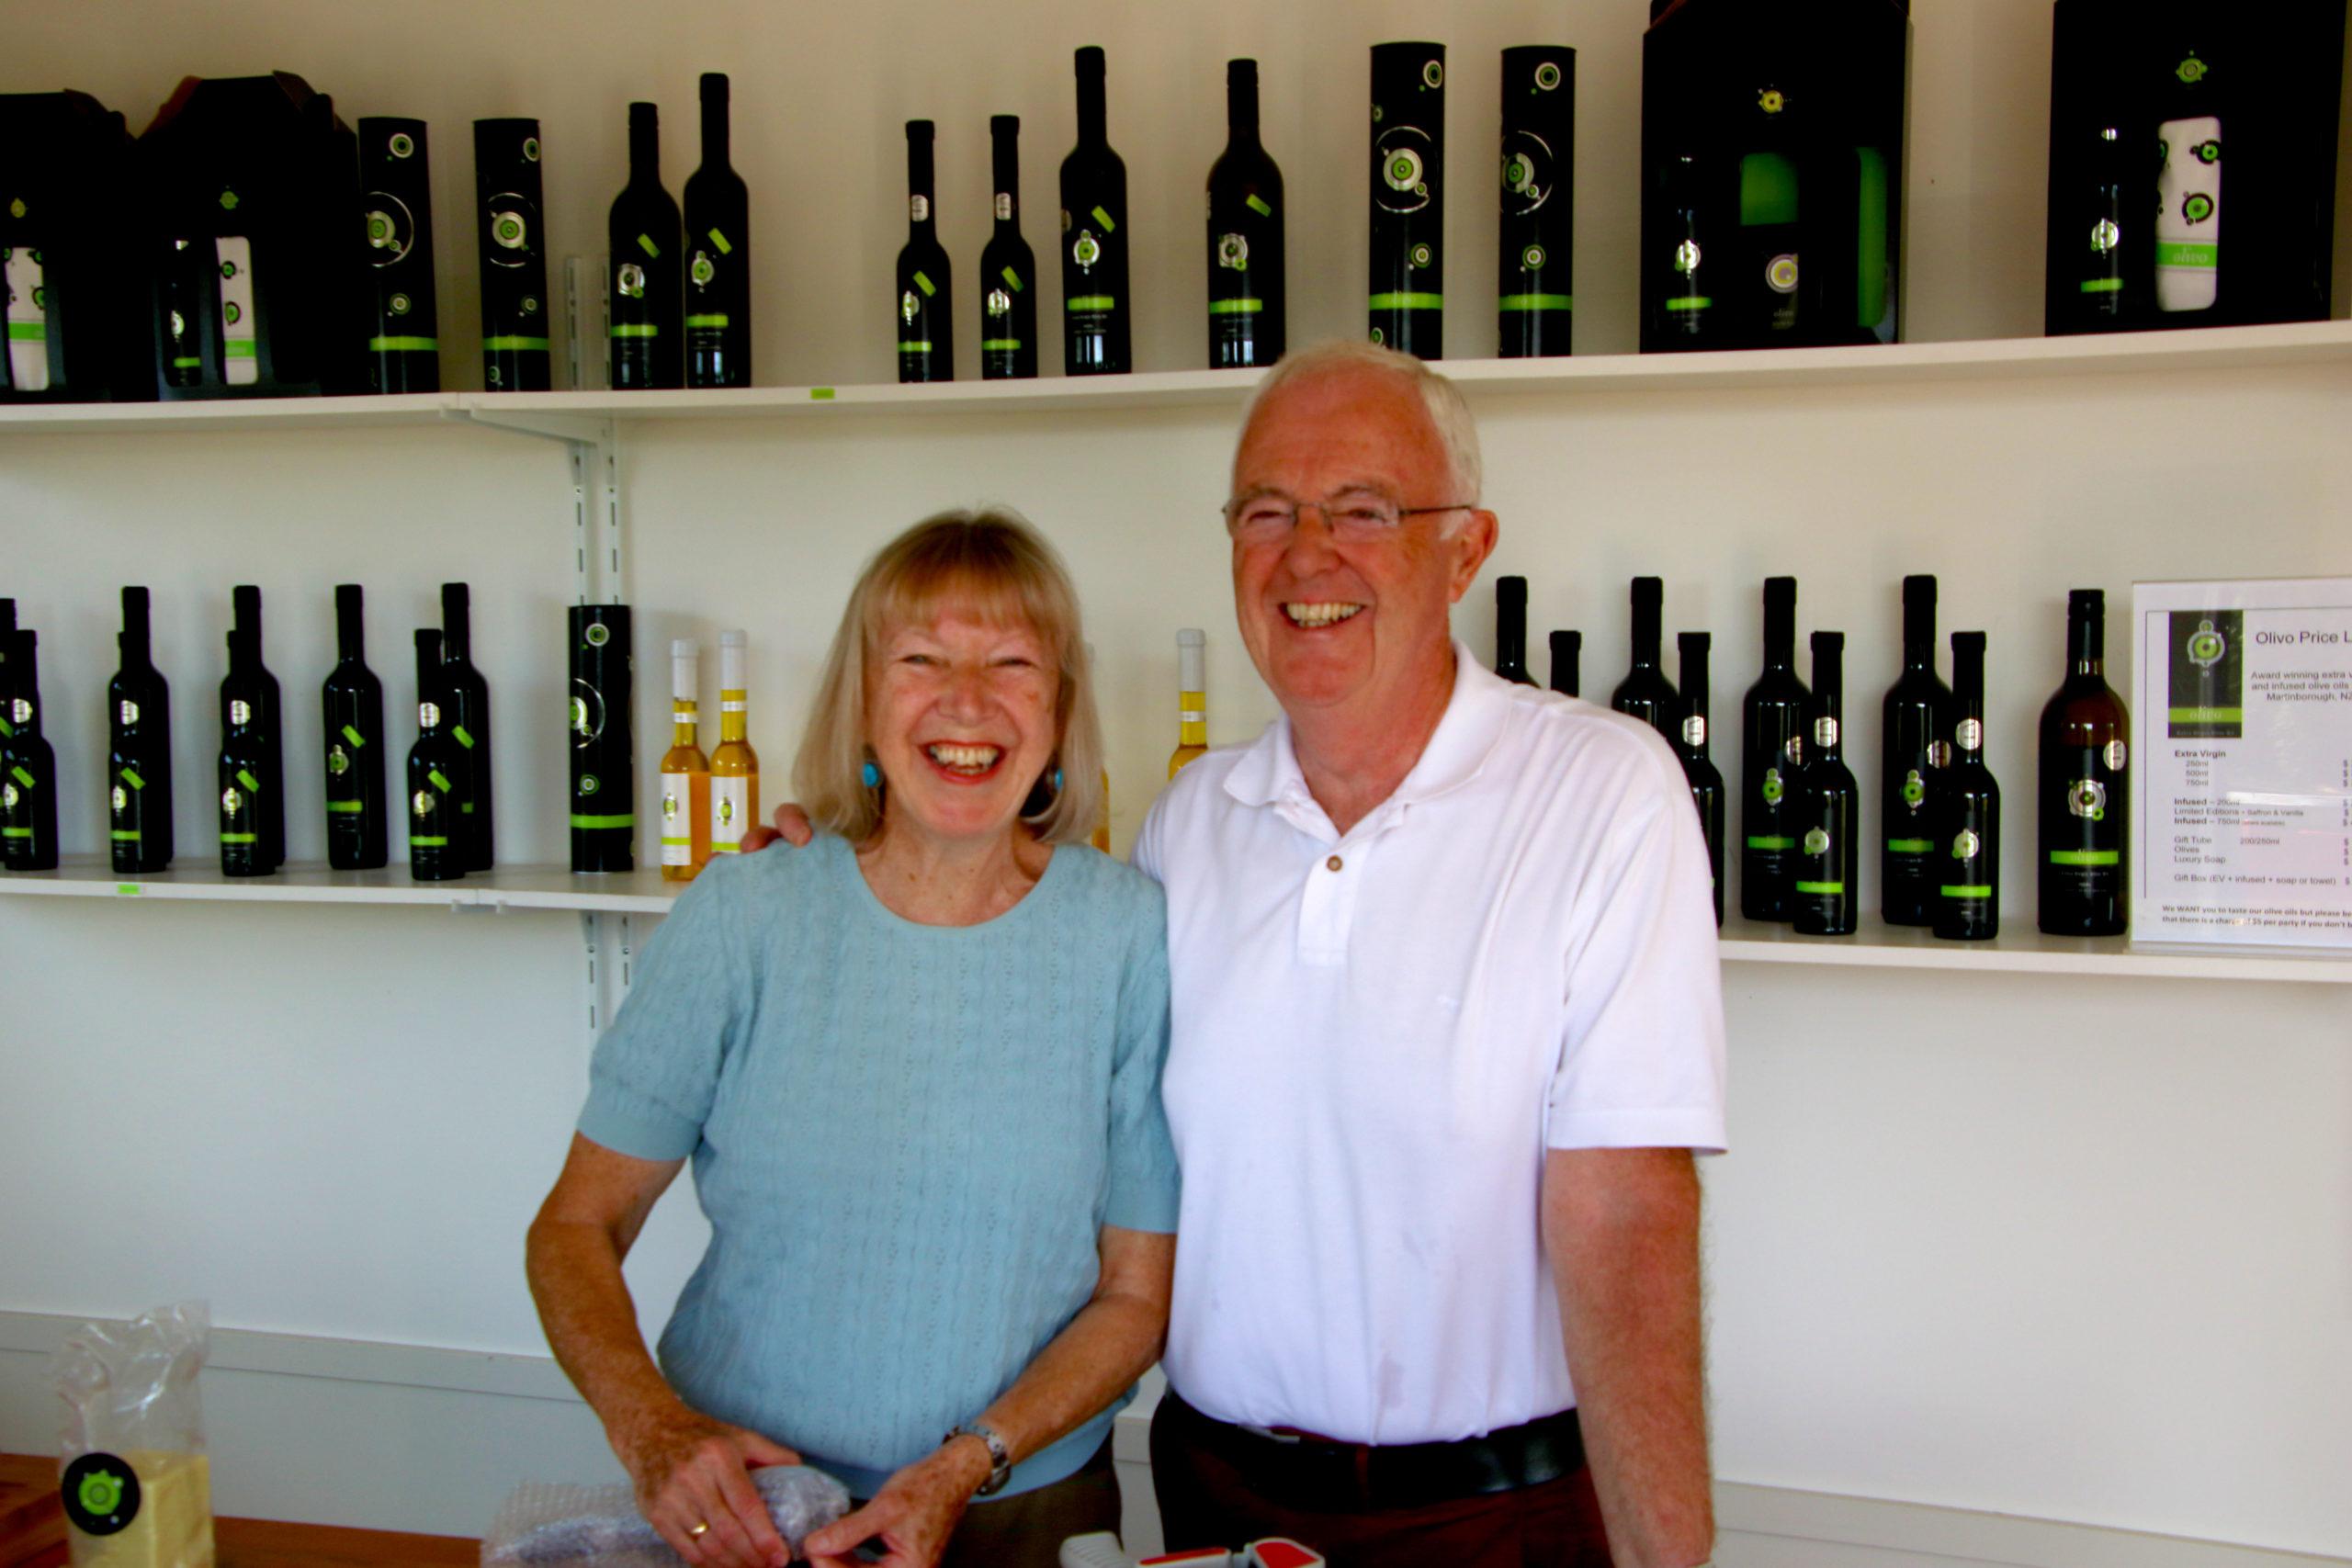 John and Helen from Olivo